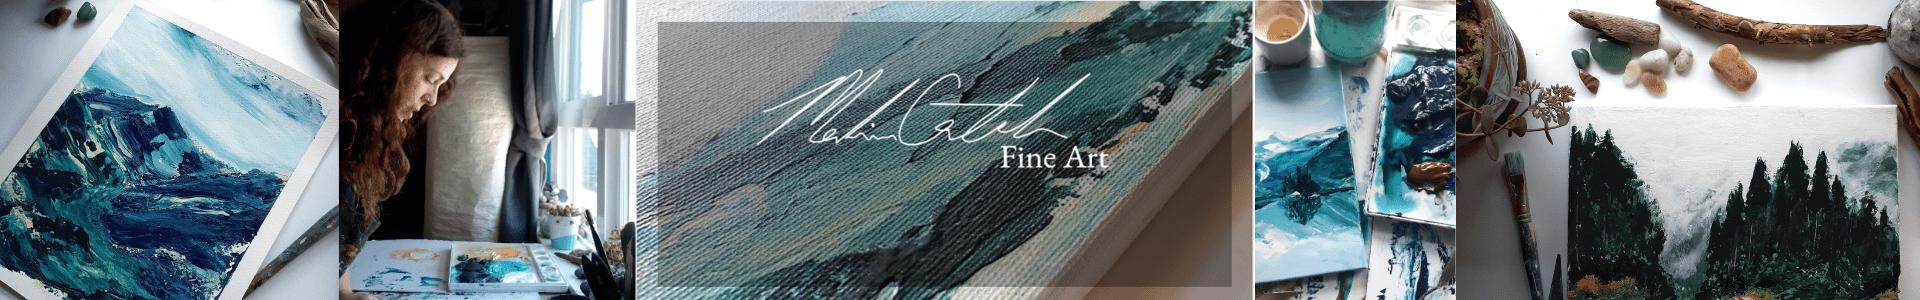 Melissa Critchlow Fine Art